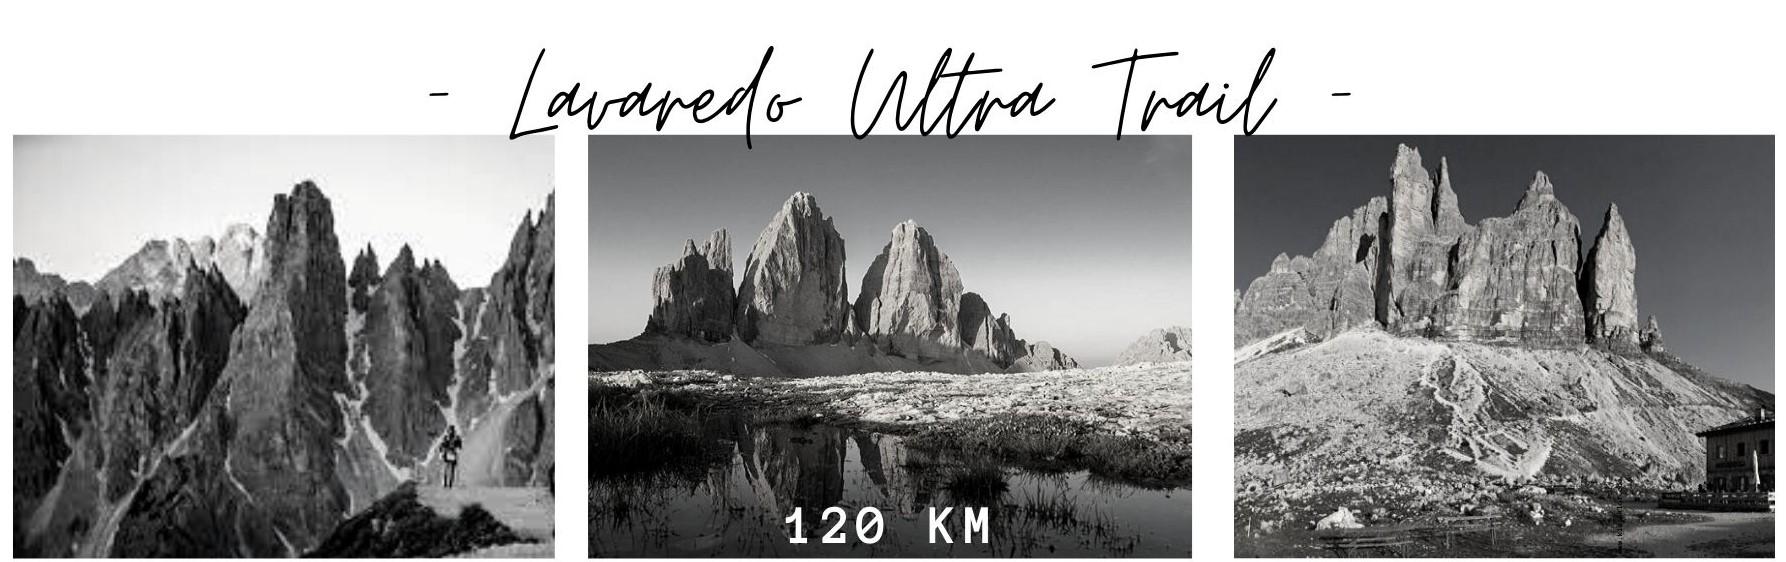 lavaredo ultra trail running